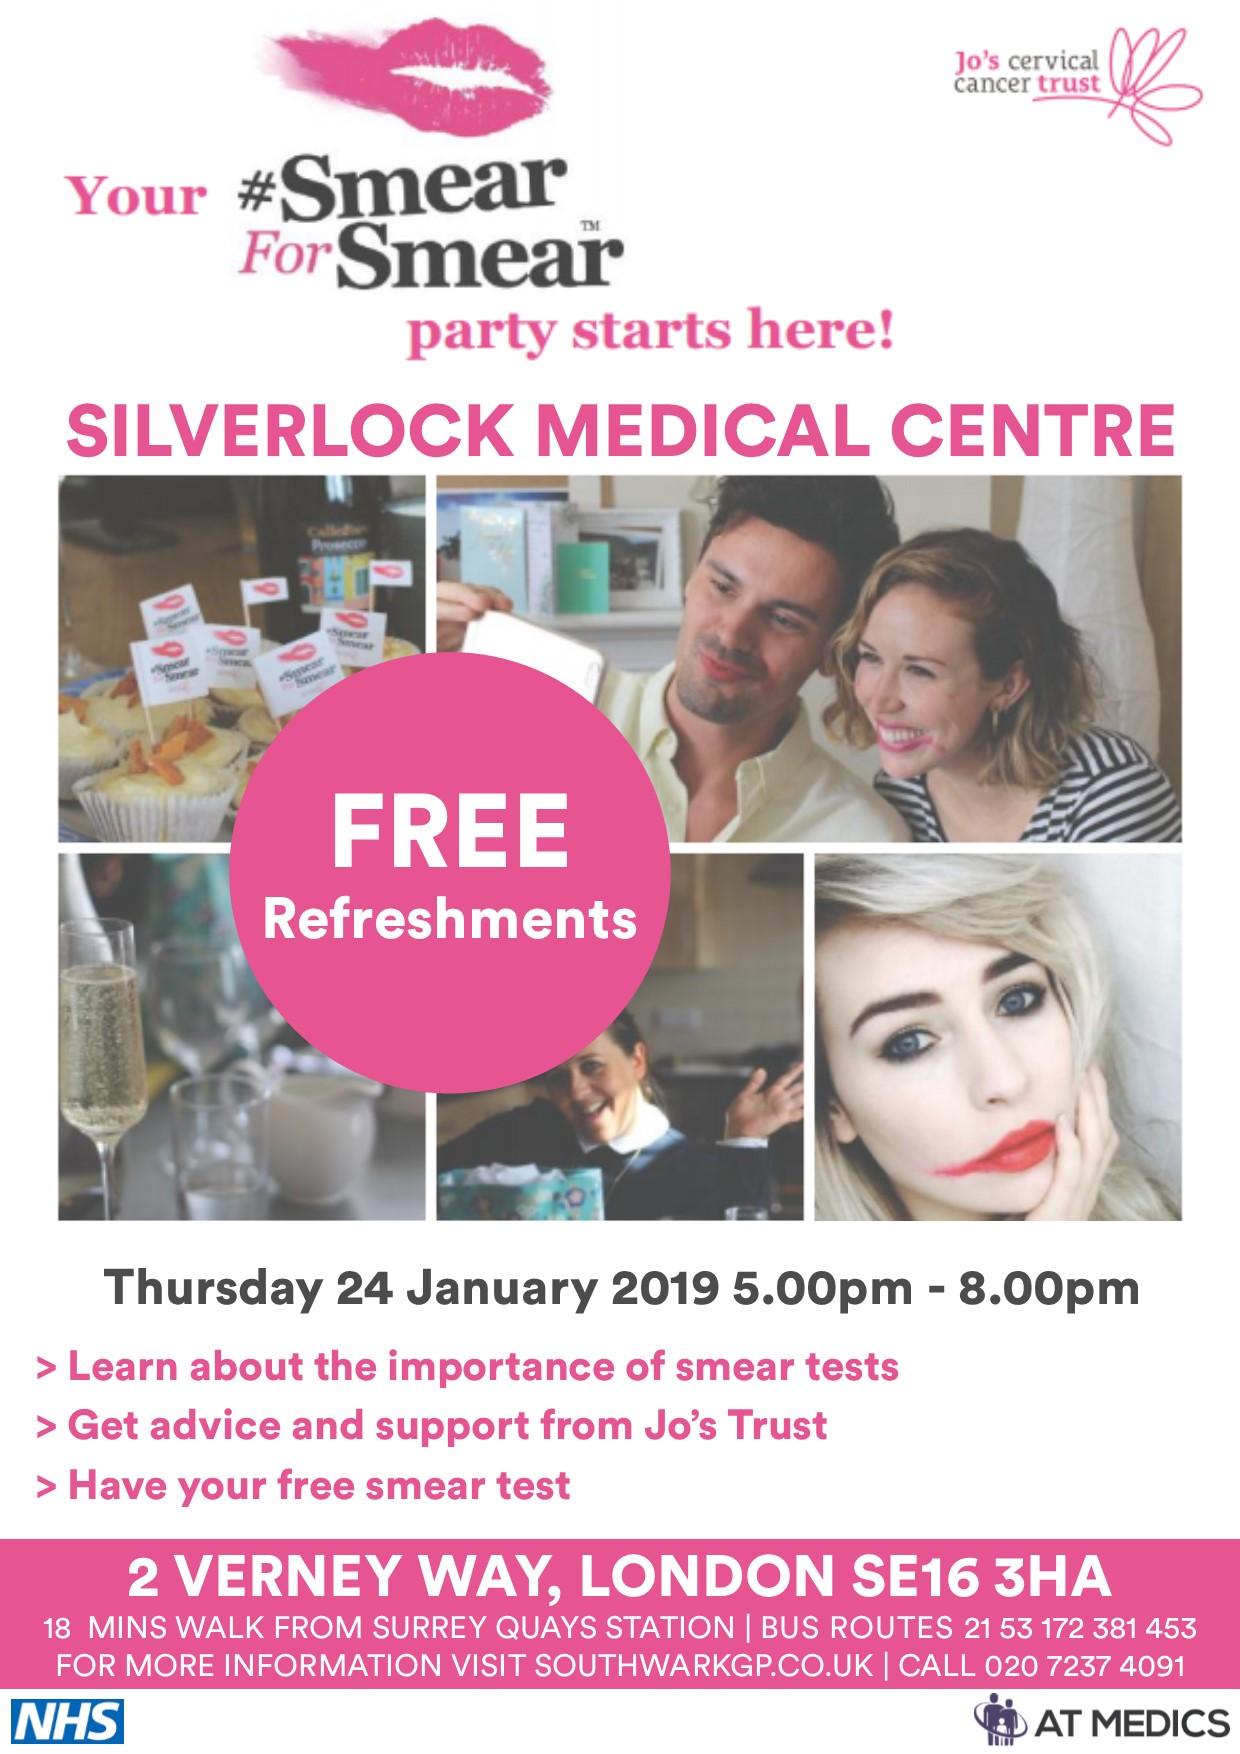 Silverlock Medical Centre Smear Awareness Event- Thursday 24 January